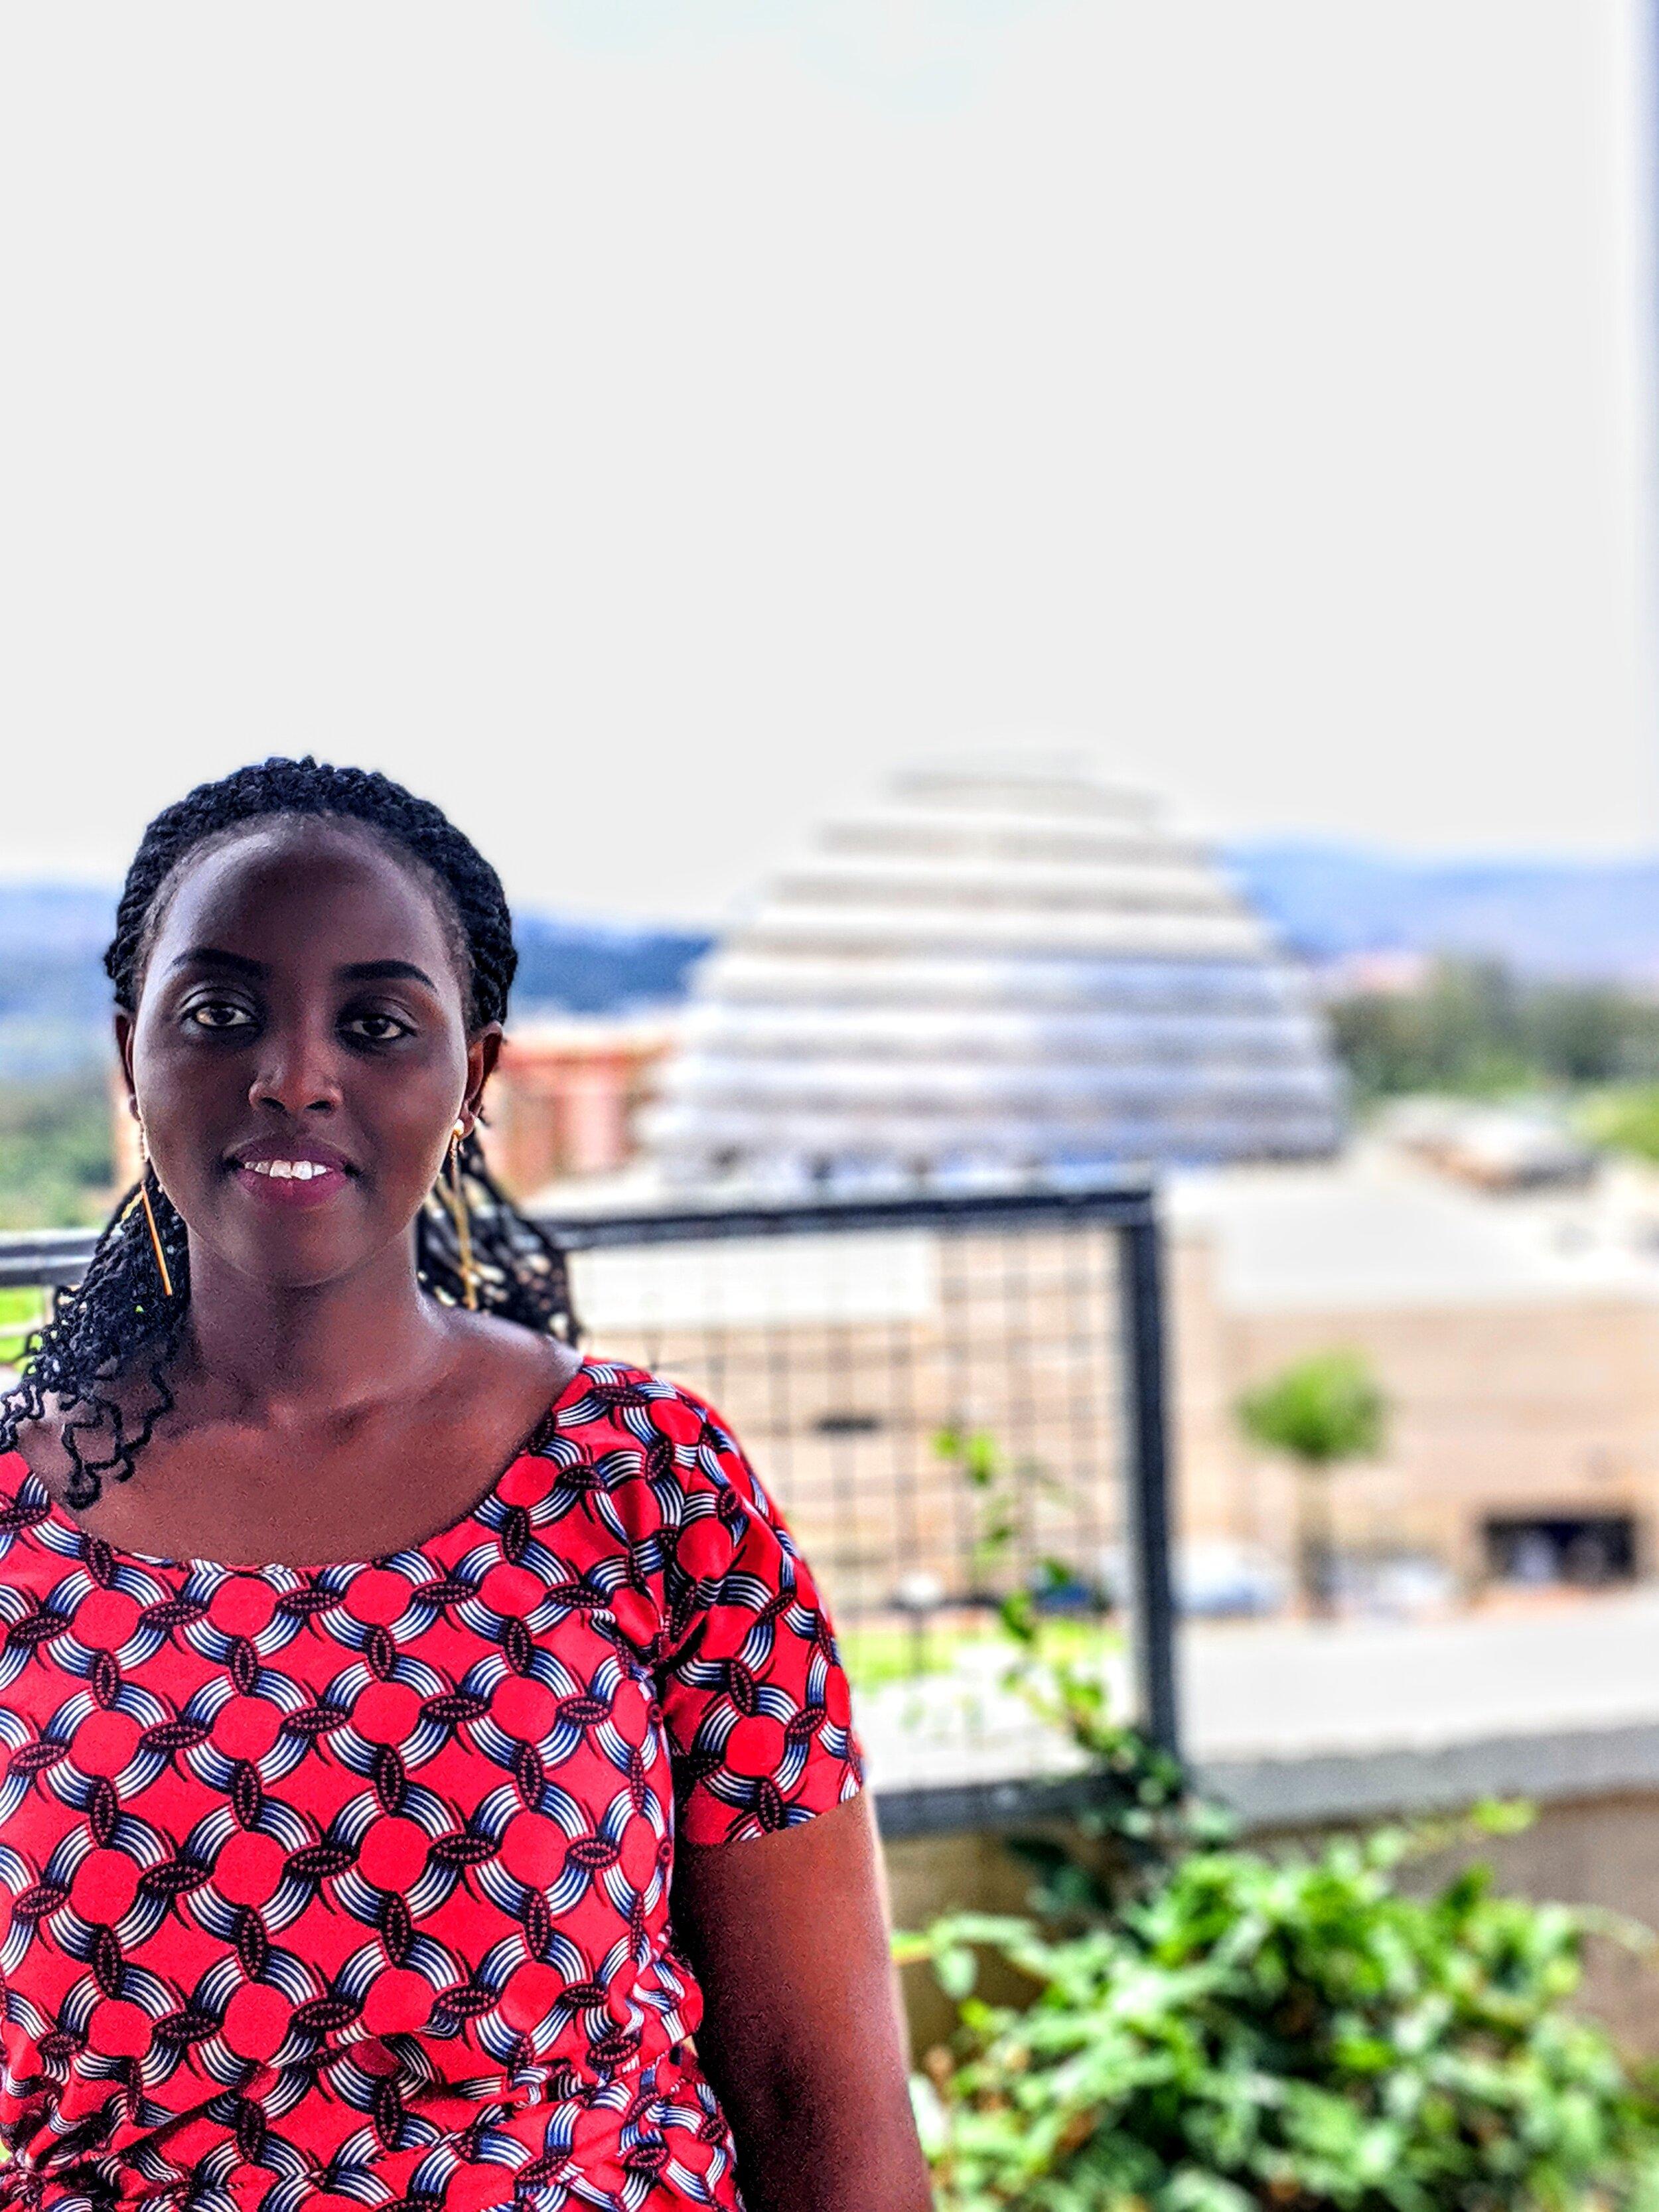 Mireille Tesire - Mireille works as a Marketing Officer for BenefFactors Ltd. She has her bachelor's degree (International Business) from Mount Kenya University